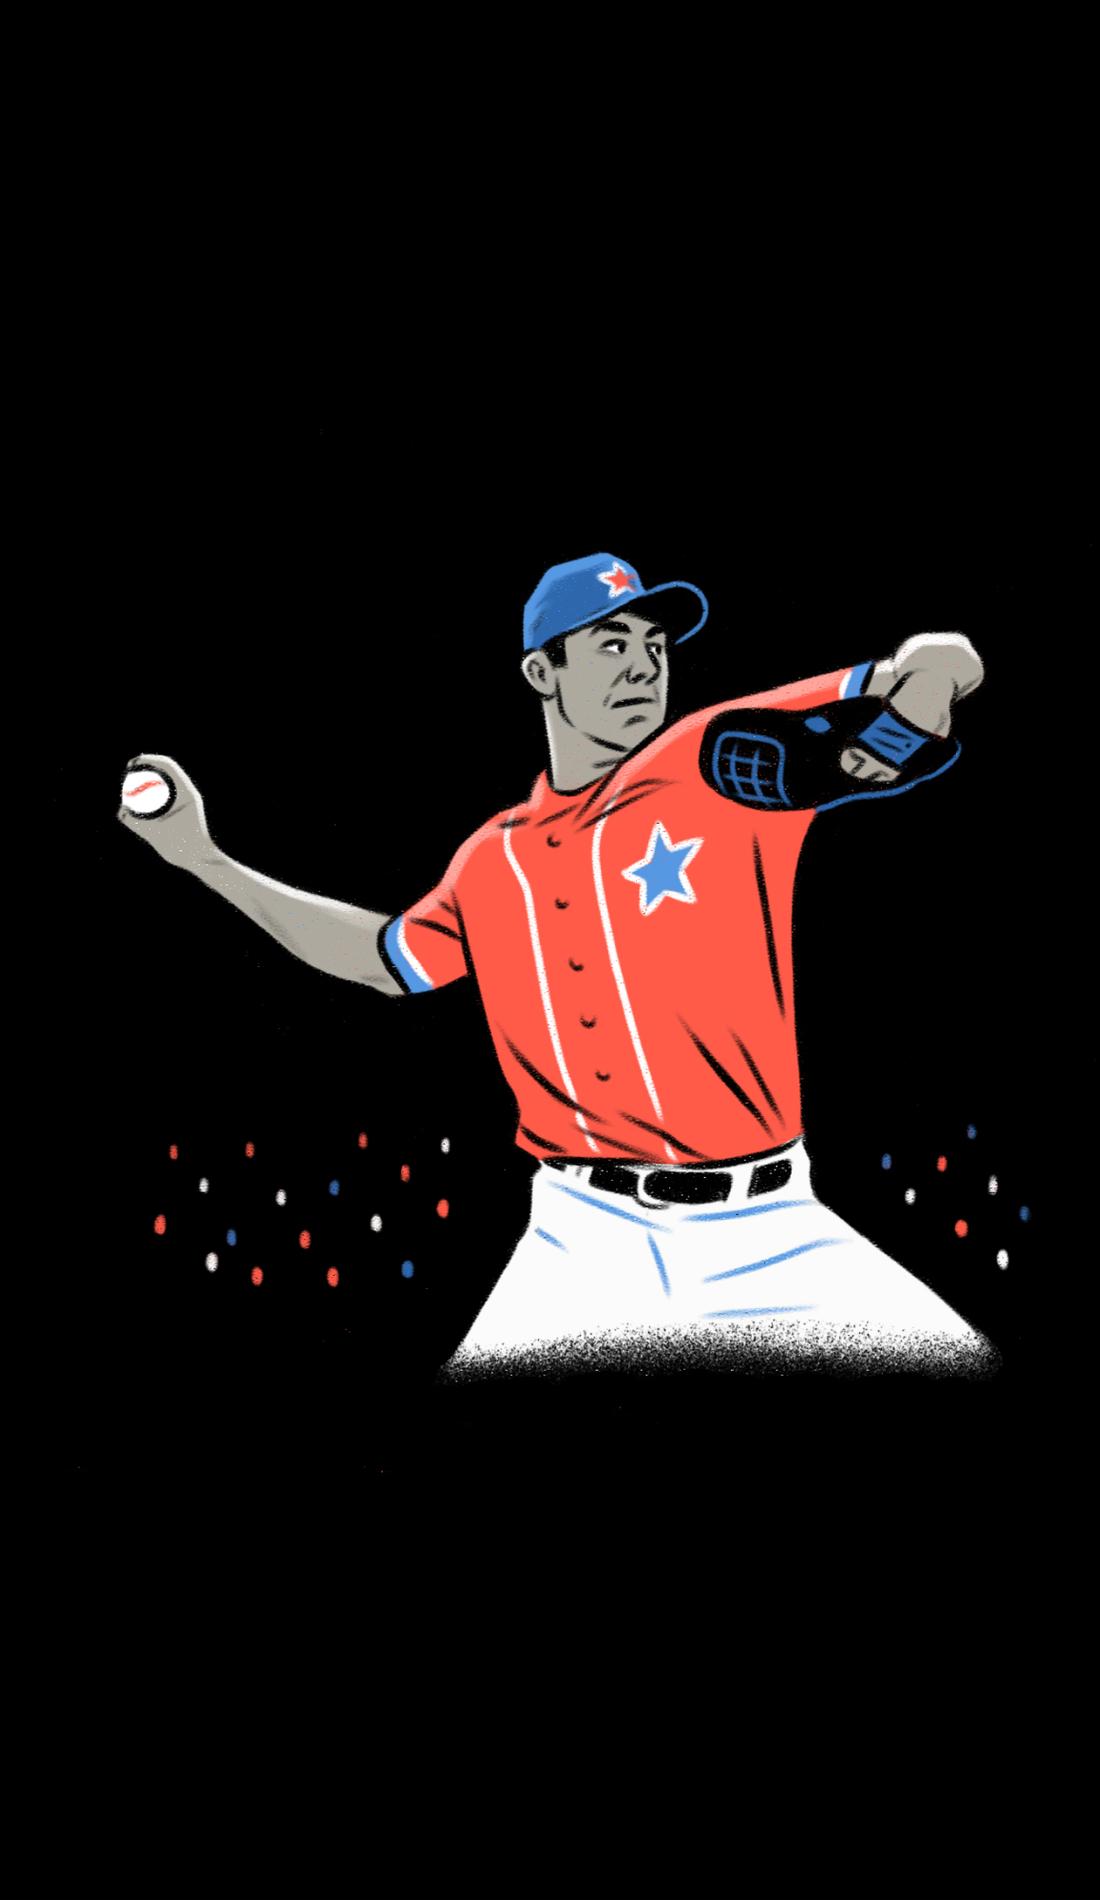 A North Carolina Tar Heels Baseball live event